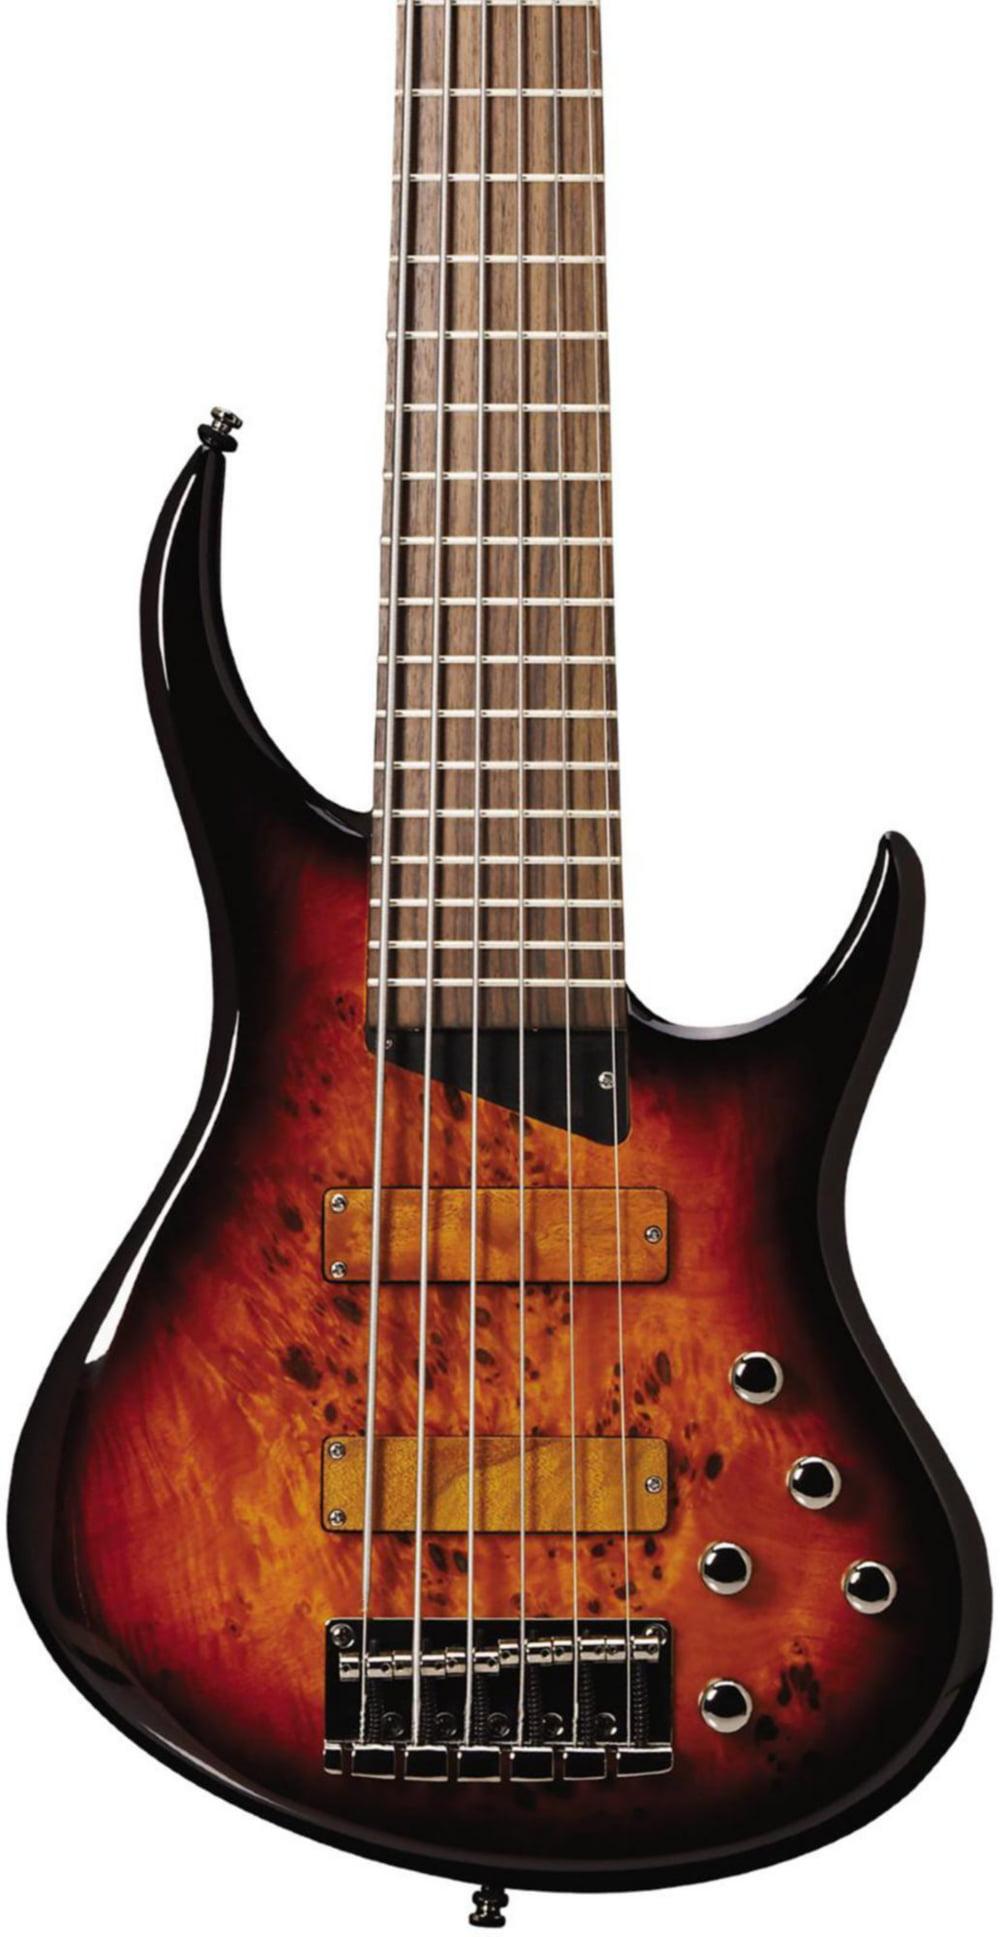 Kingston KZ 6-String Bass by MTD